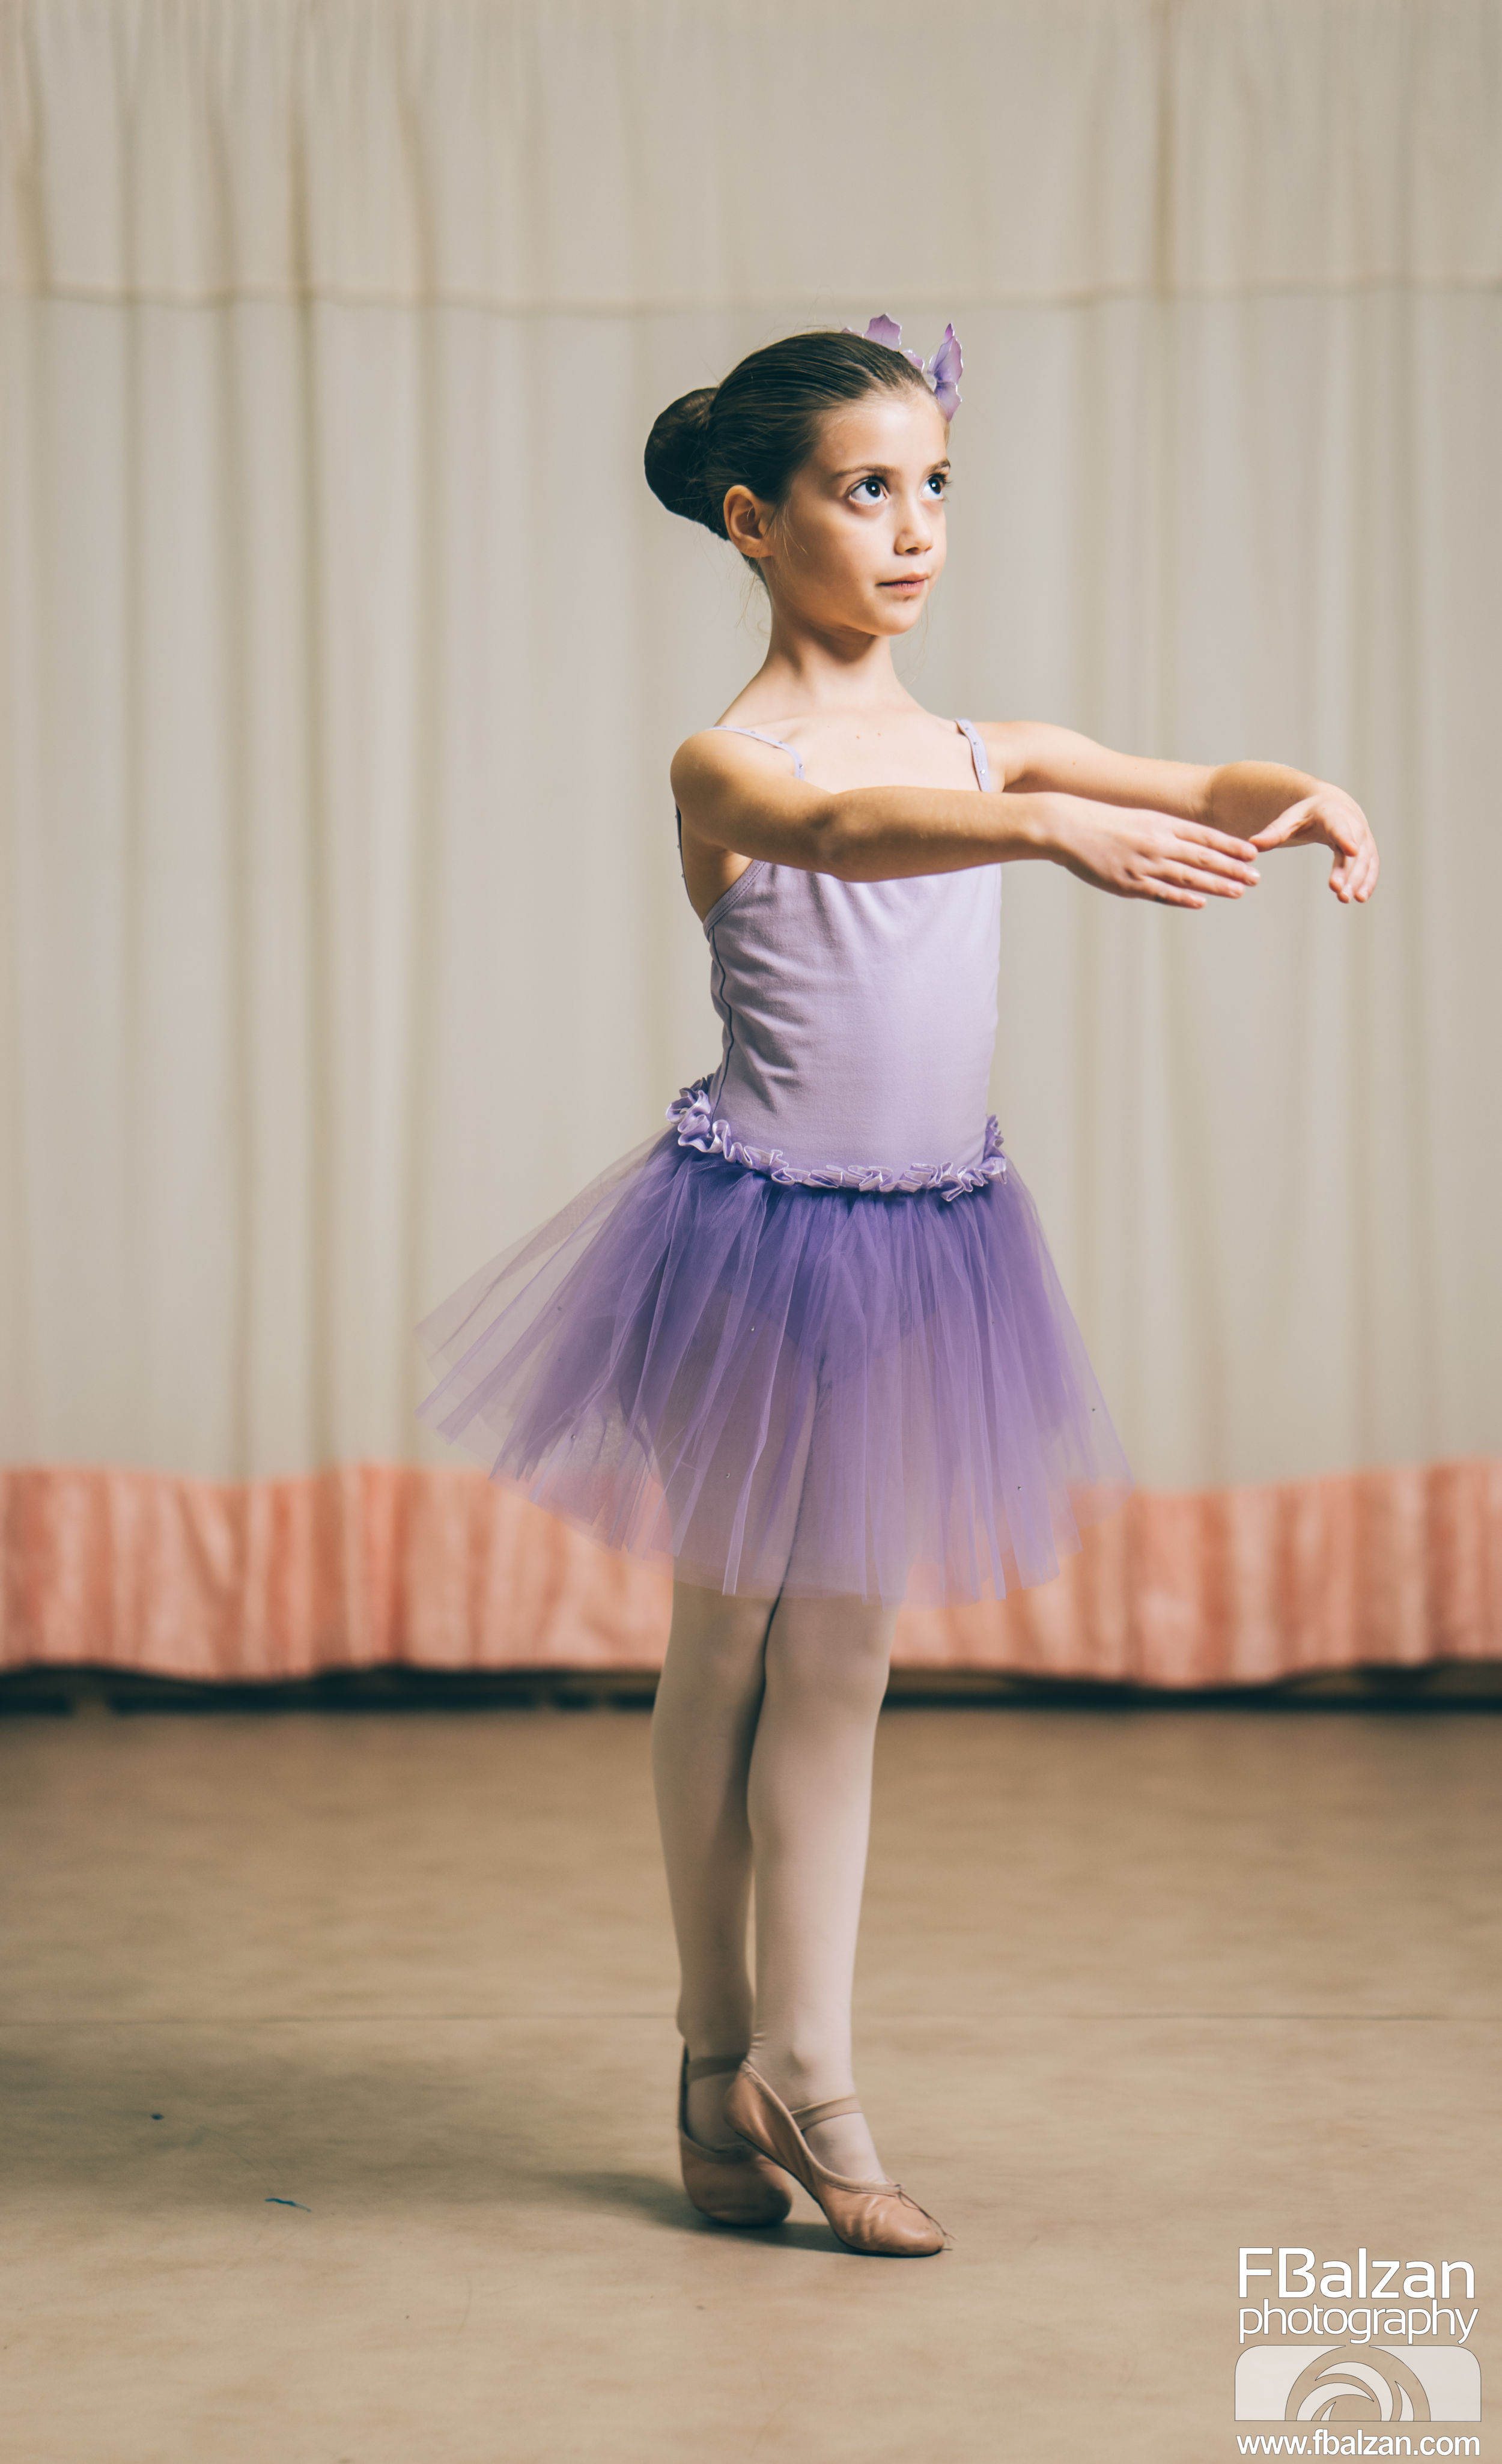 350 -  Ballet school.jpg